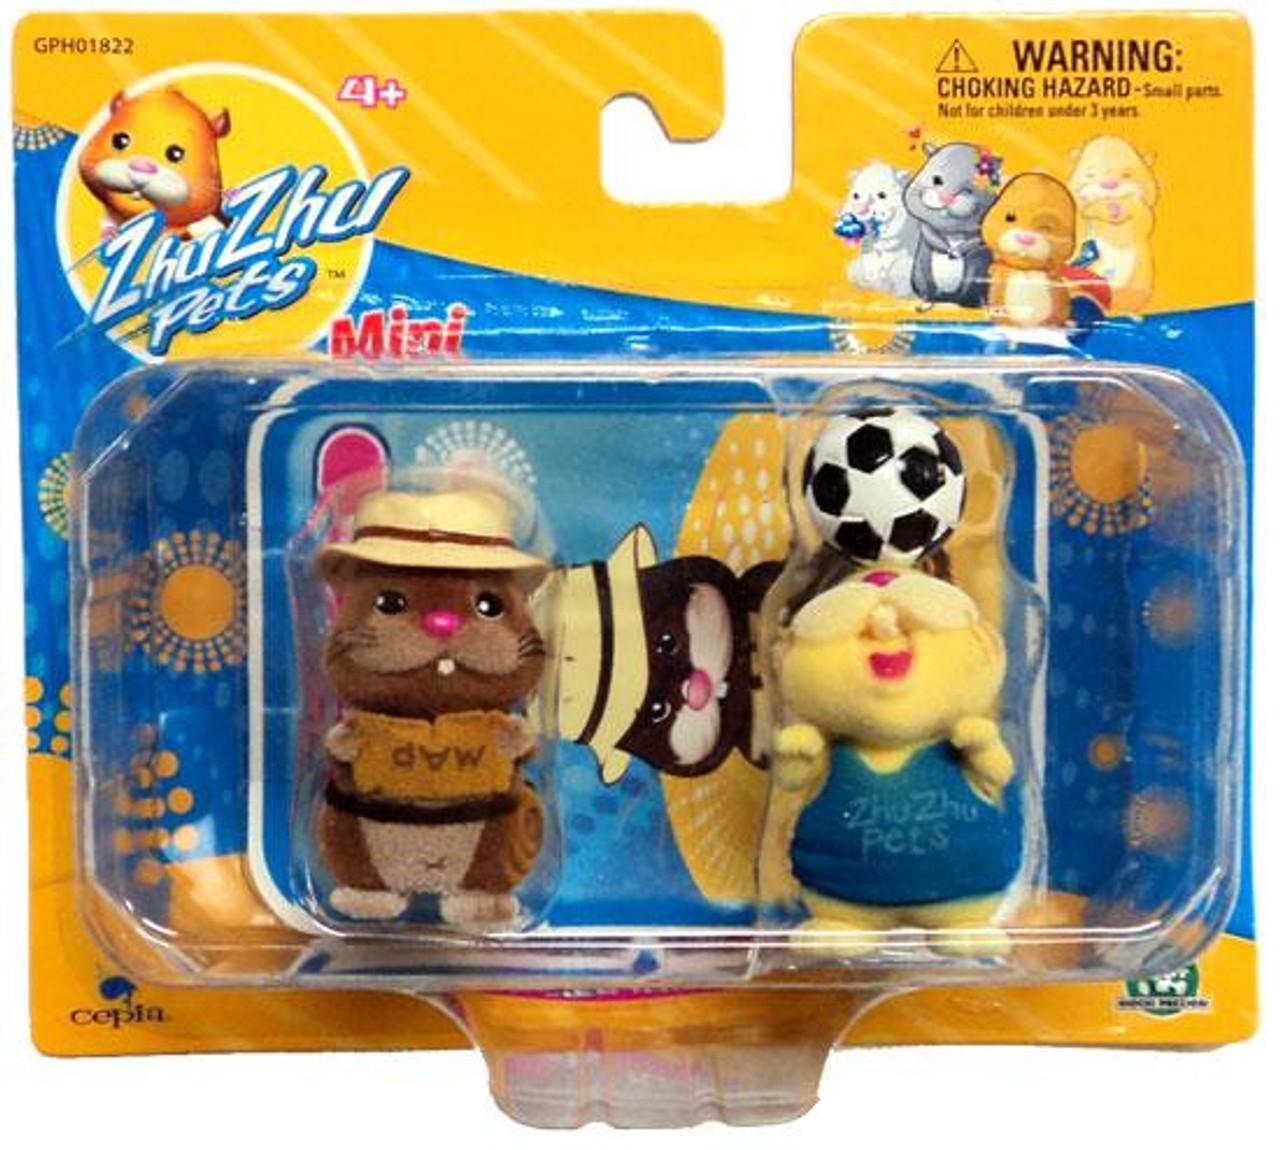 Zhu Zhu Pets Scoodles & Pipsqueak Mini Figure 2-Pack